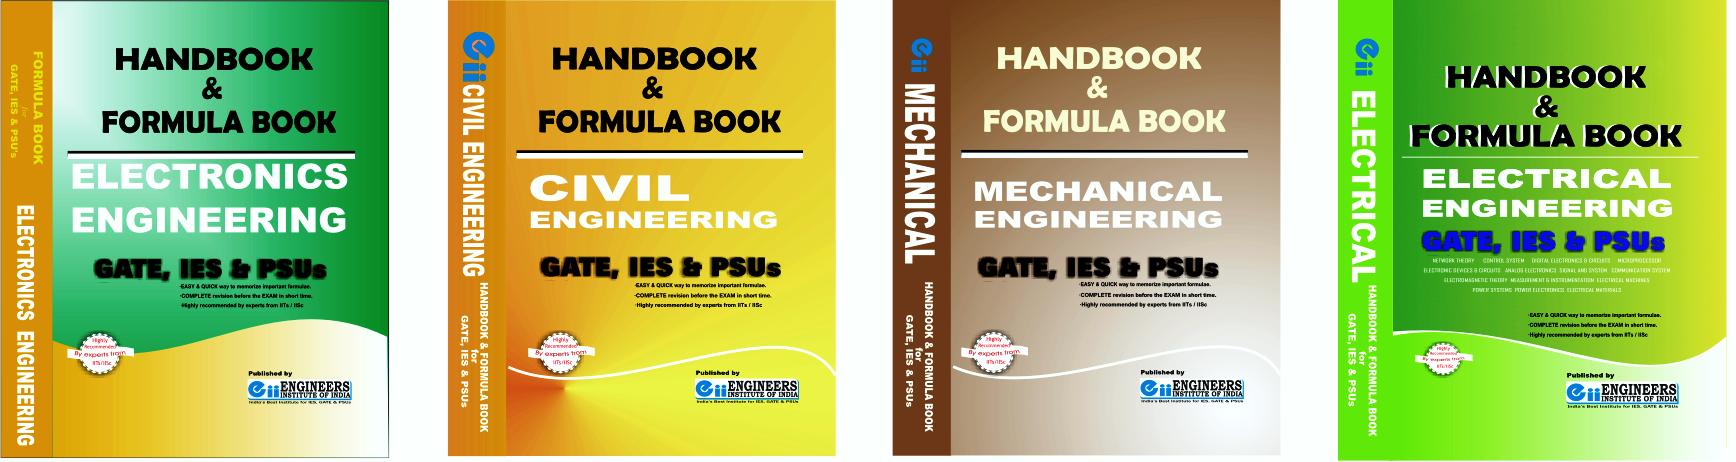 Gate Eee Books Pdf